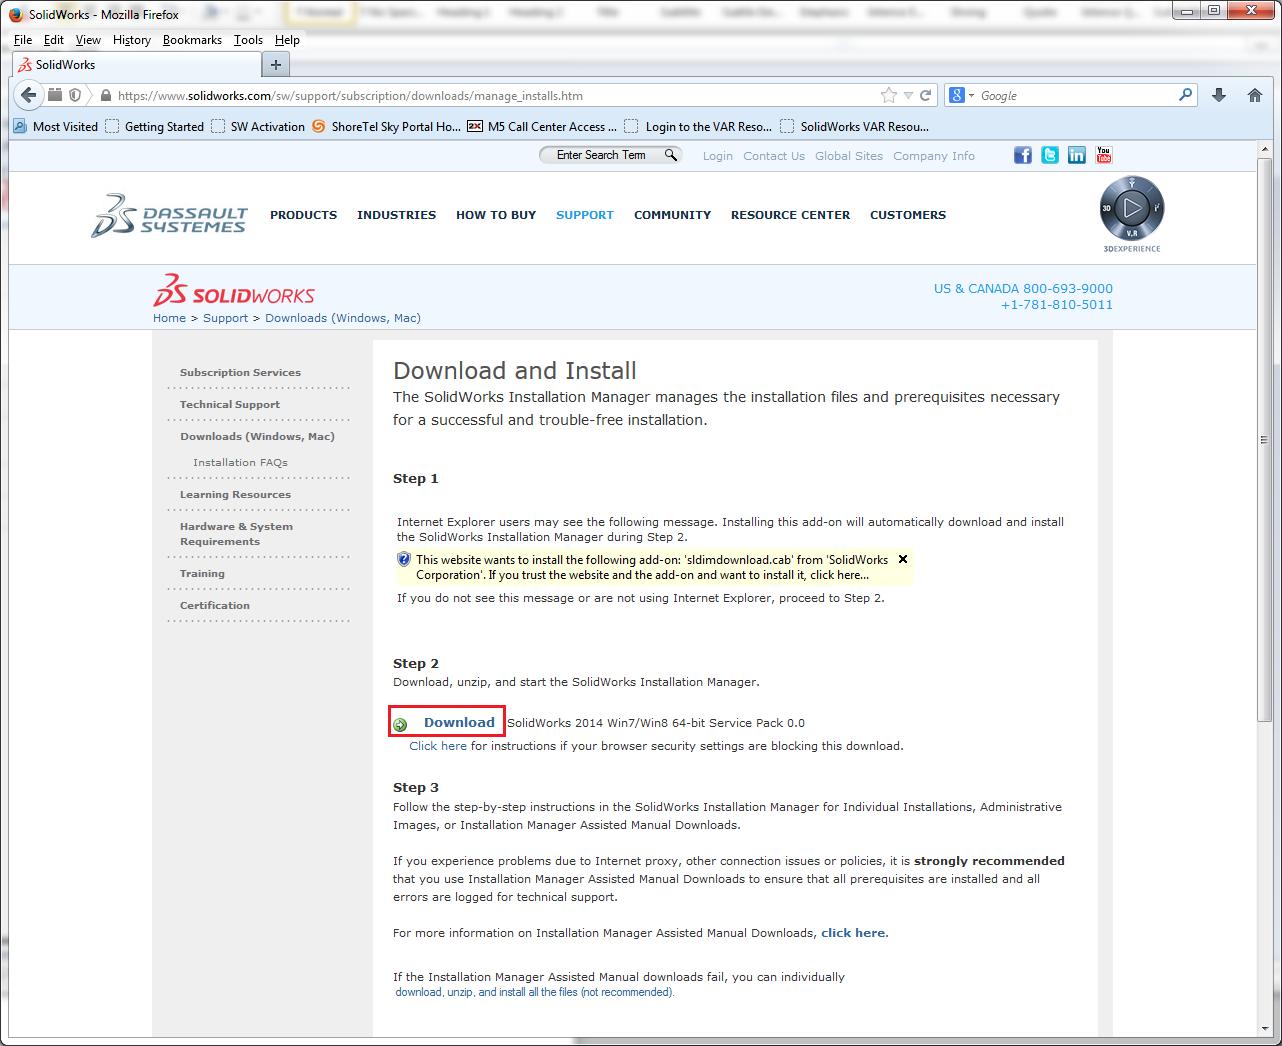 solidworks 2014 32 bit torrent download